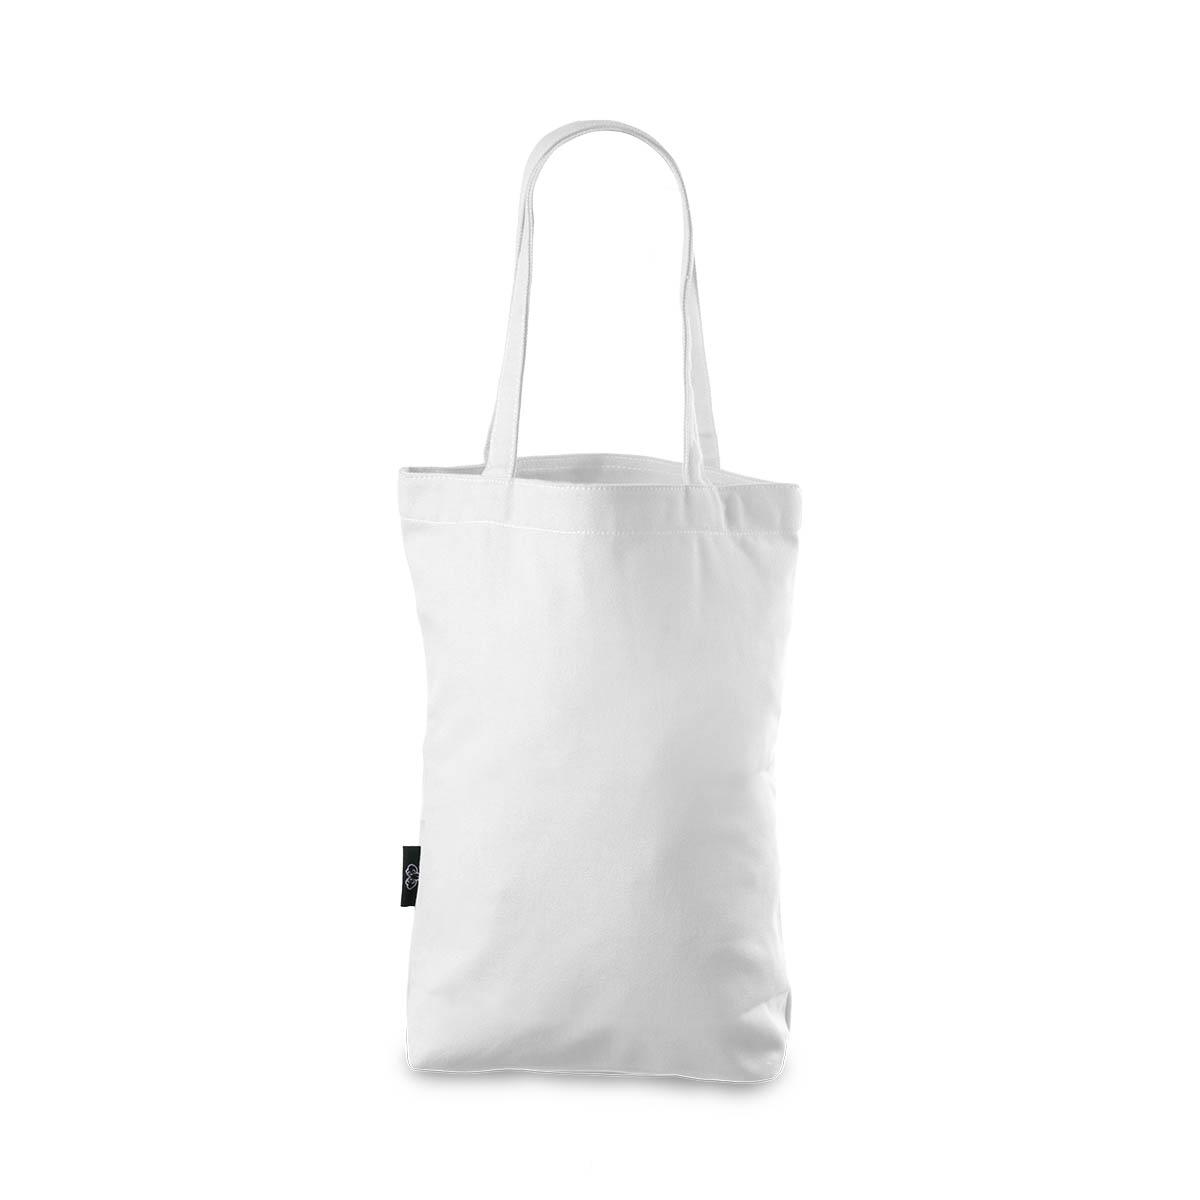 Tribu Ladies Tote Bag (White) – TribuNation 4aabb4163492e